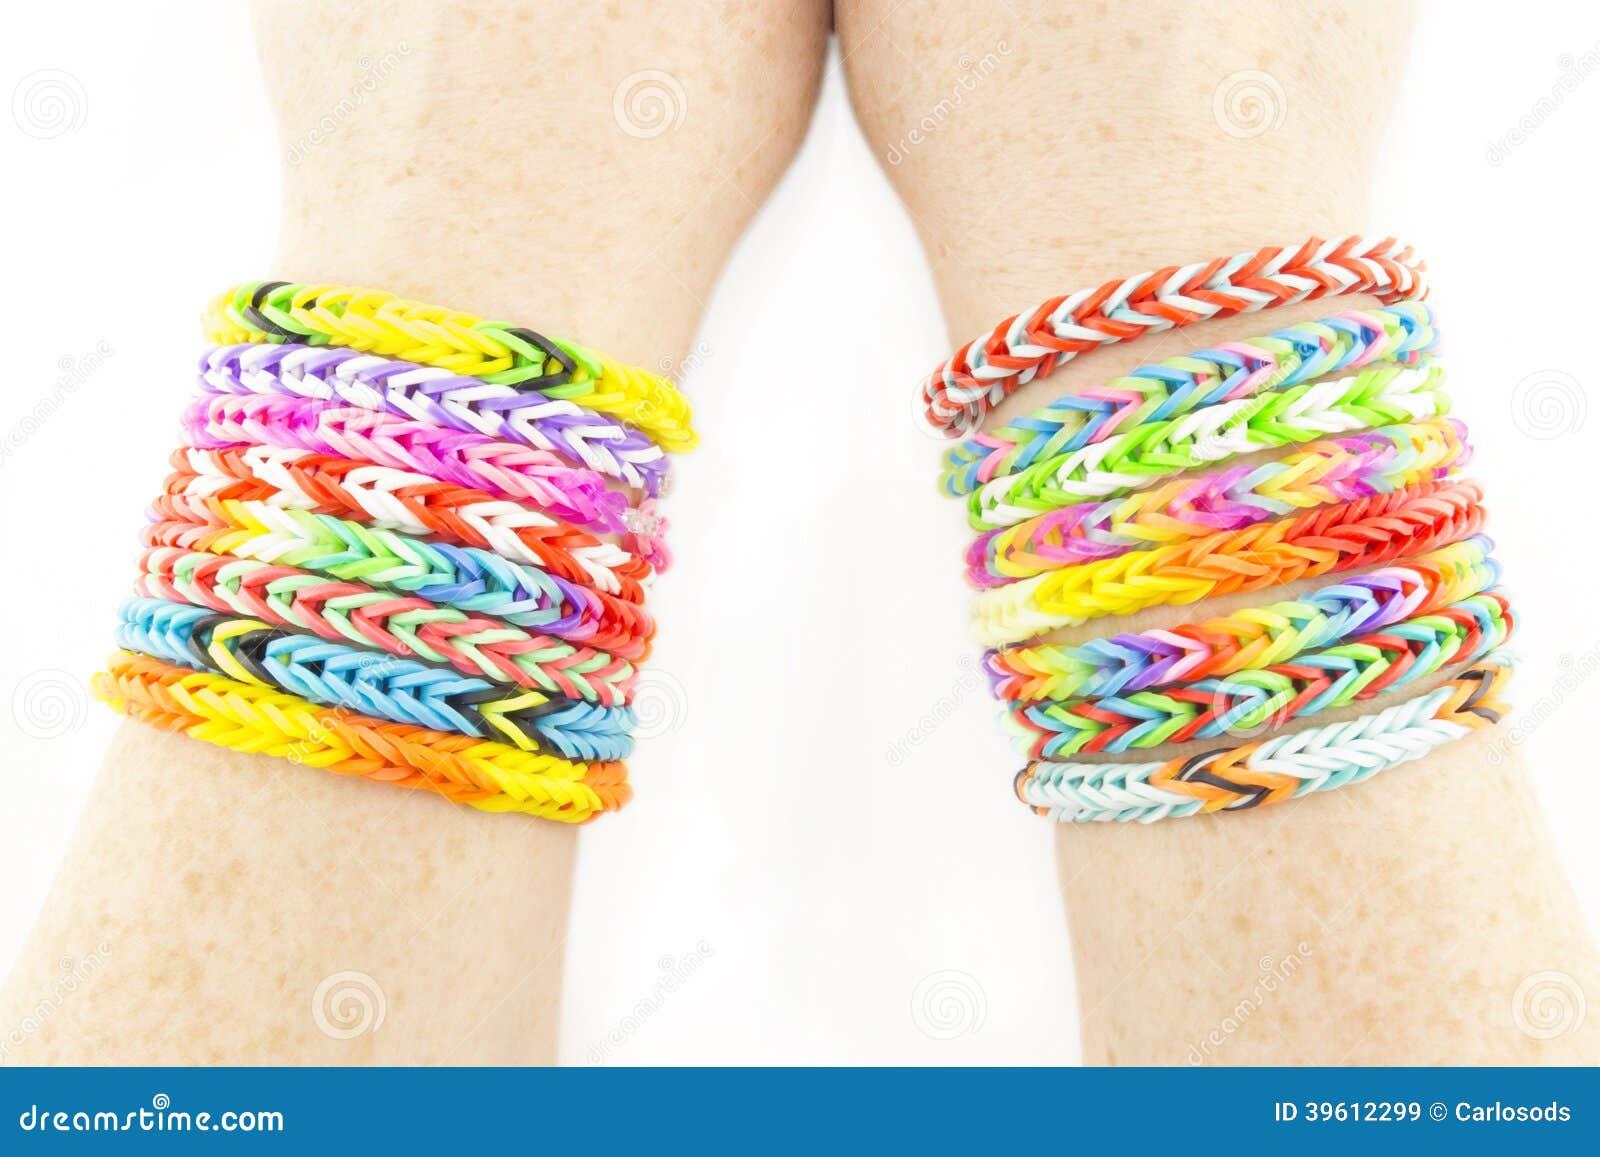 Bands Bracelets Rubber